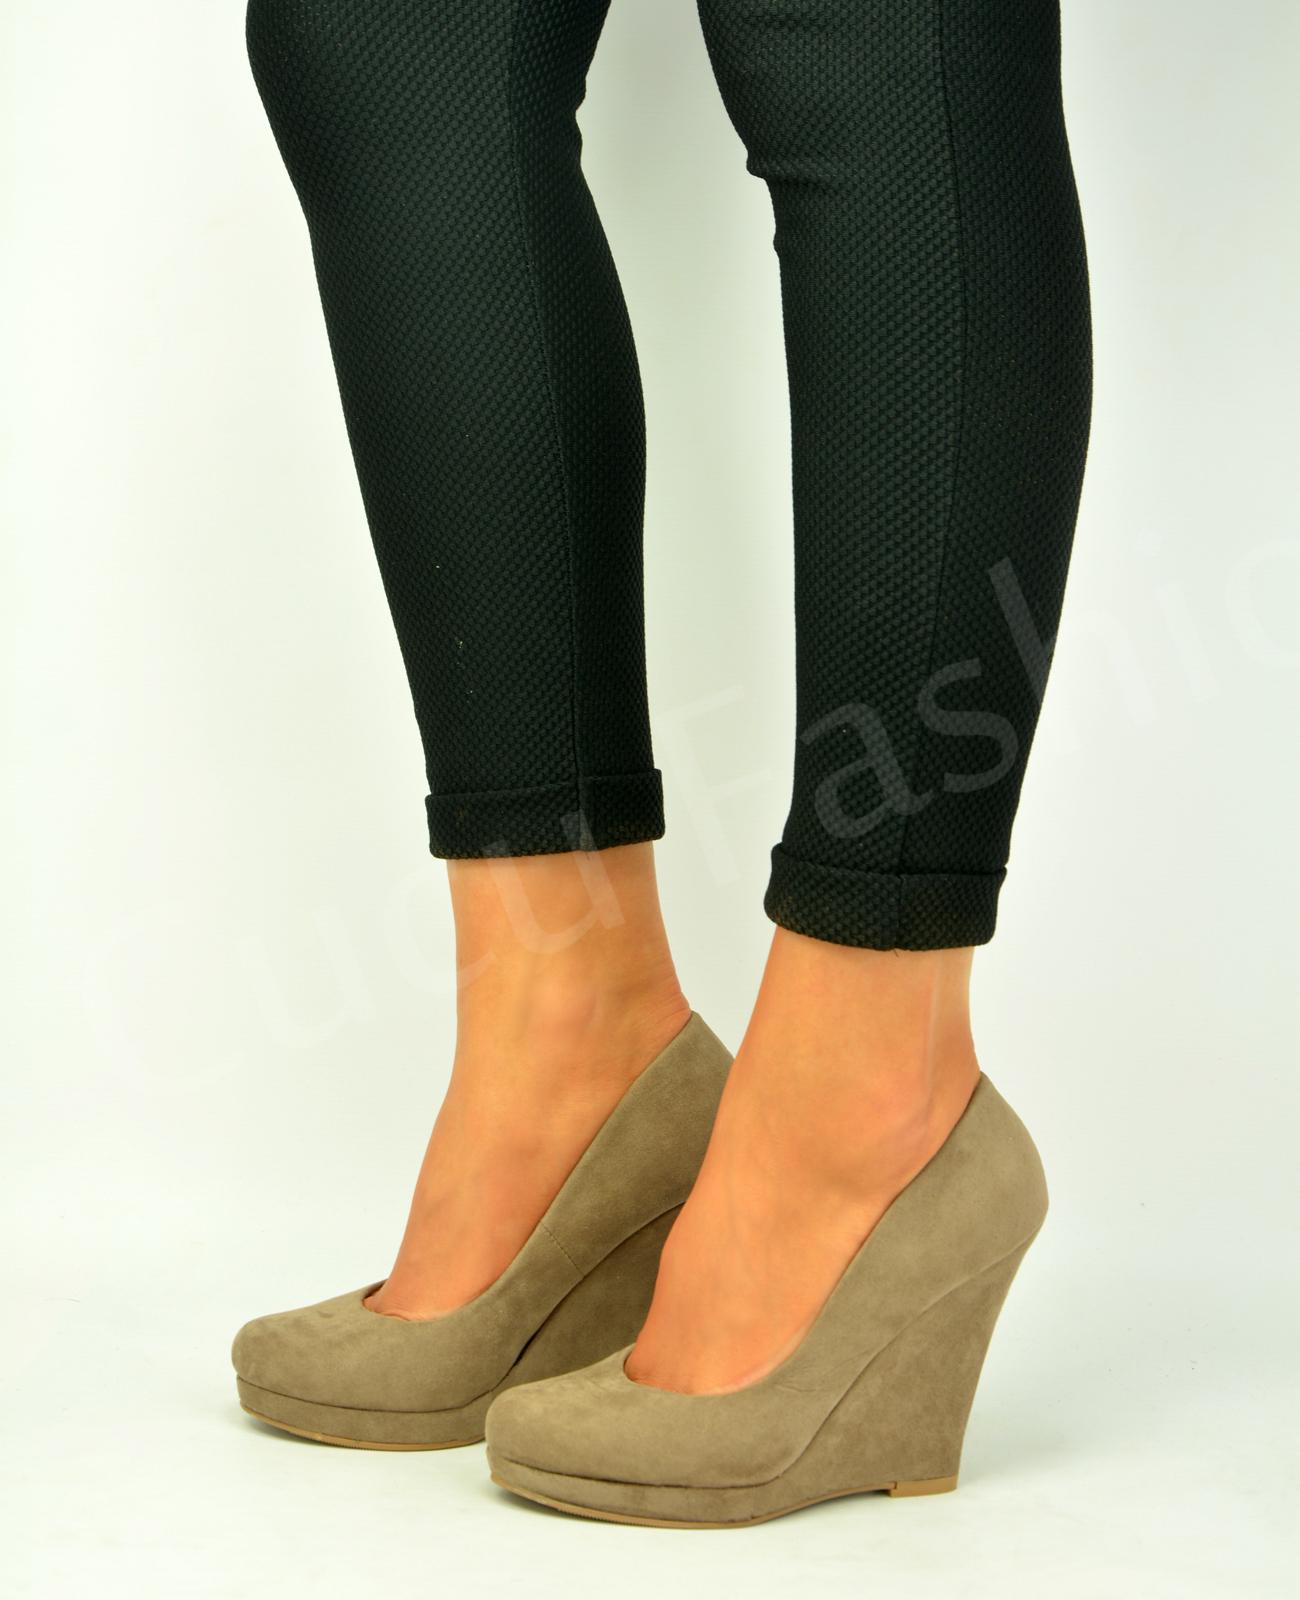 New Womens Wedge Heel Pumps Ladies Pull On Closed Toe